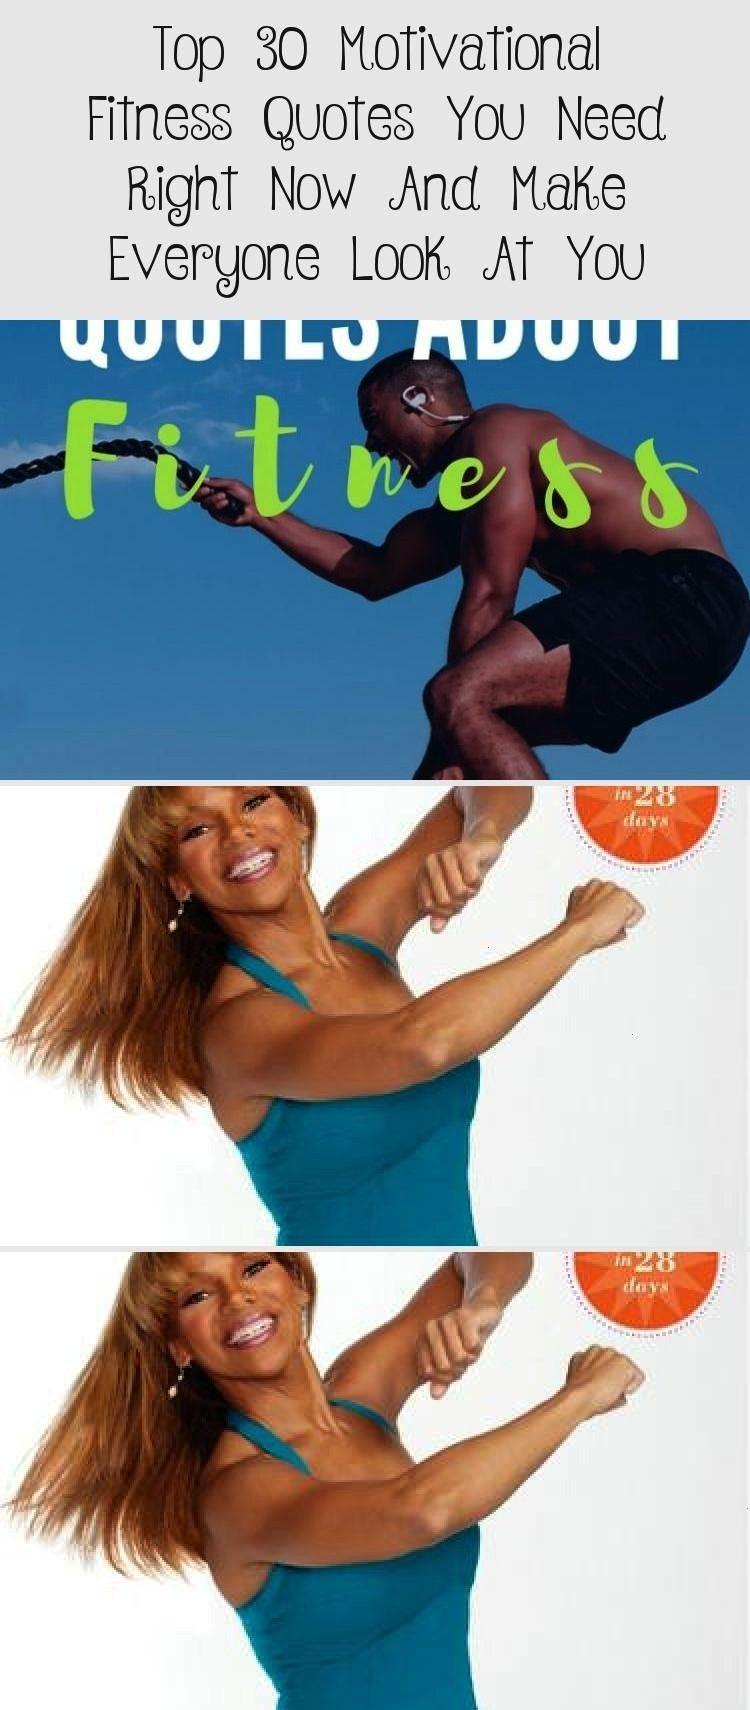 #lifeinspiration #motivational #inspiration #motivation #exercising #exercise #fitness #excuses #not...